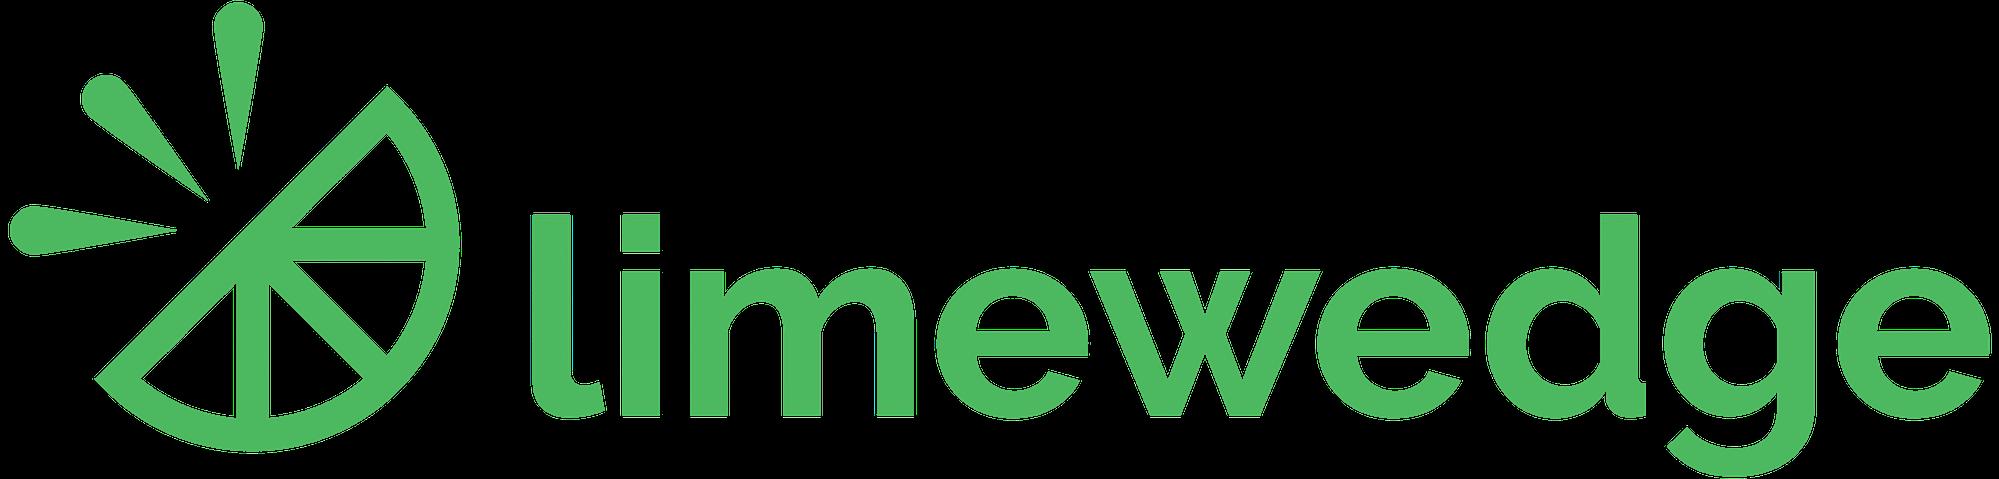 Limewedge logo